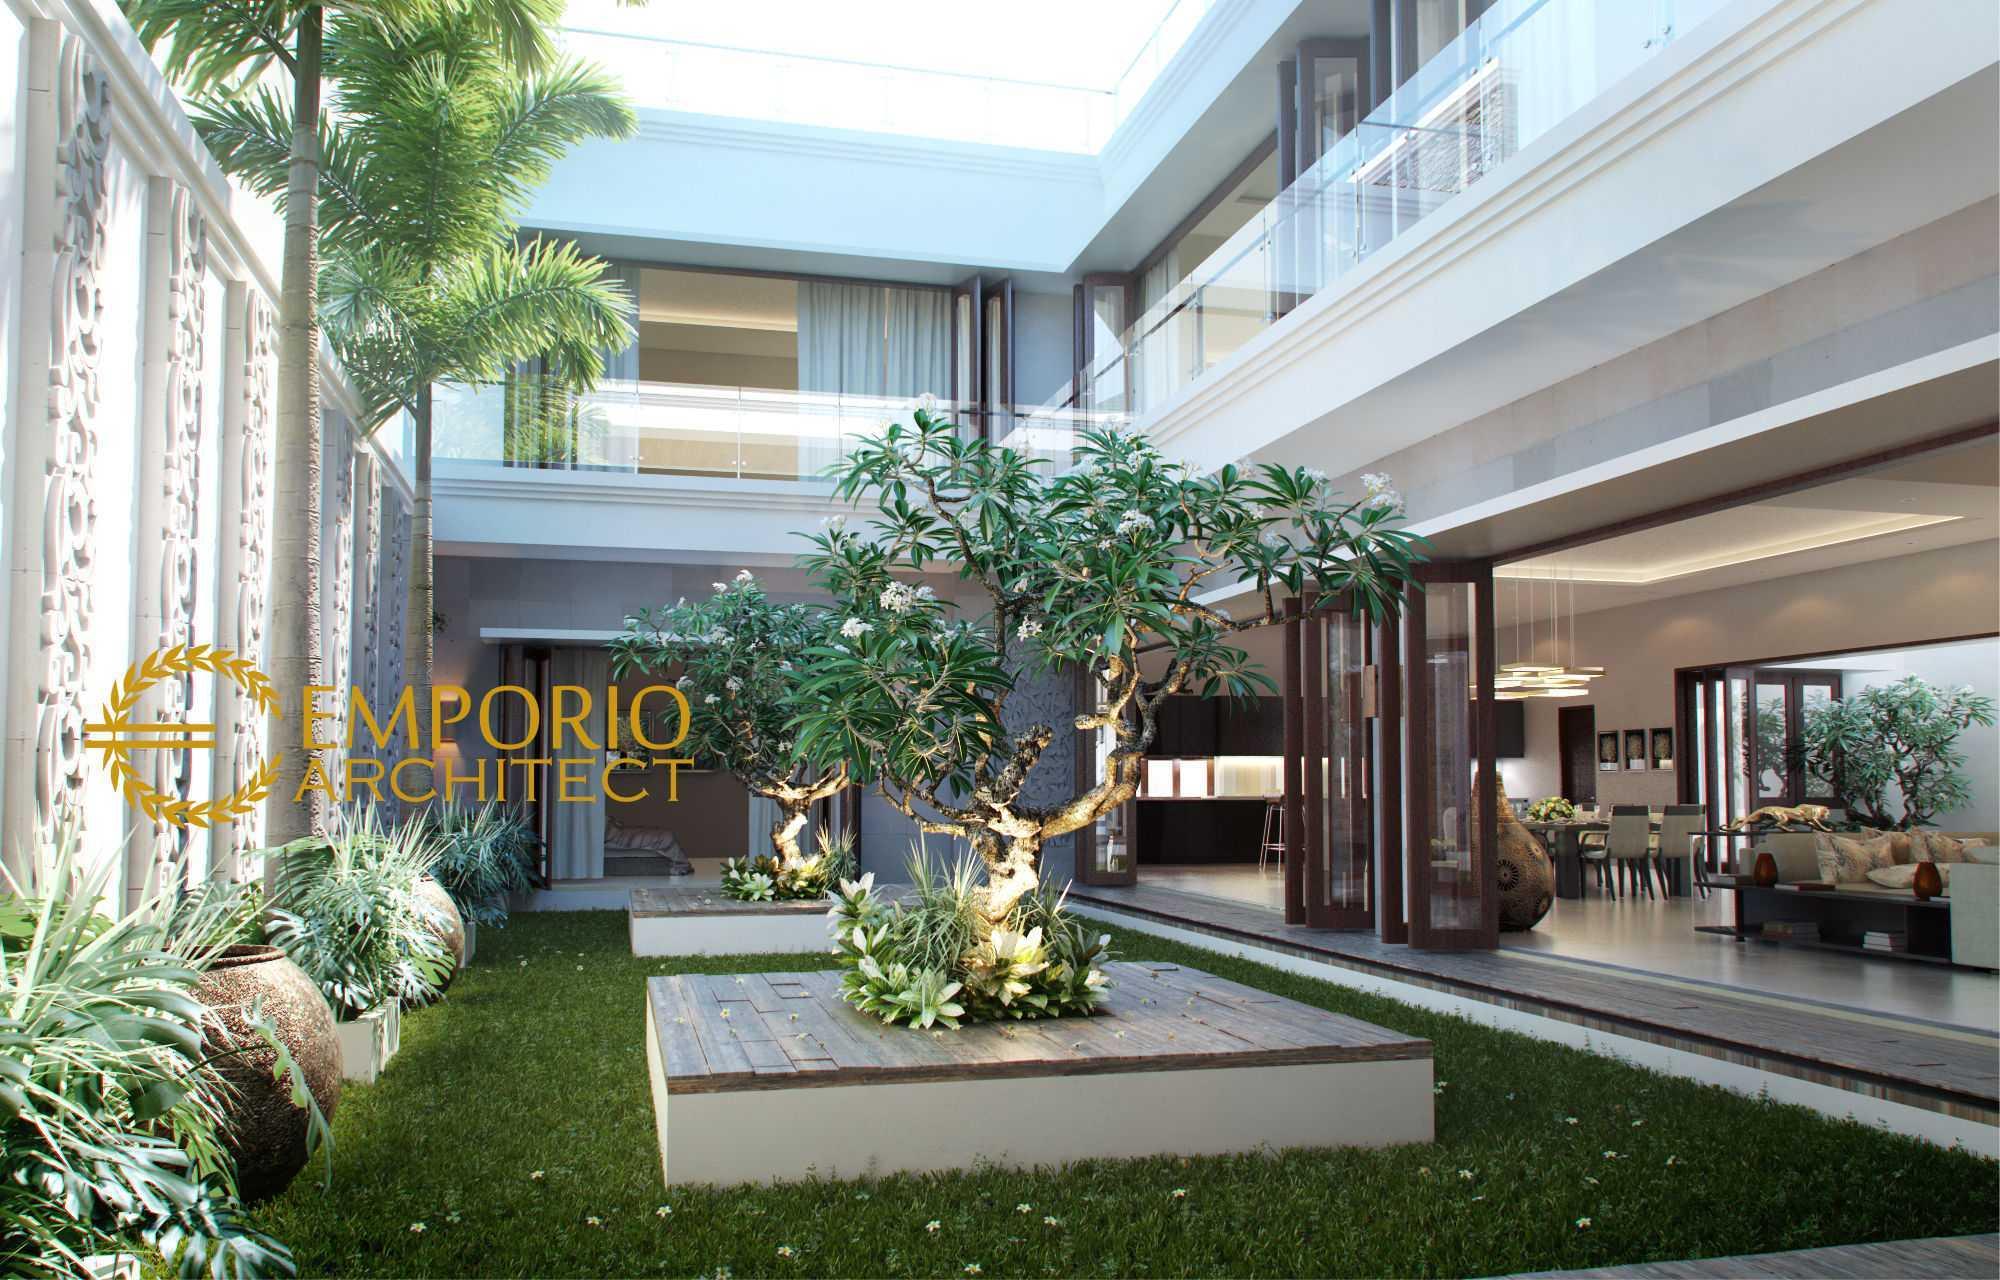 Emporio Architect Jasa Arsitek Jakarta Desain Rumah Villa Bali Tropis 153 @ Jakarta Jakarta, Daerah Khusus Ibukota Jakarta, Indonesia Jakarta, Daerah Khusus Ibukota Jakarta, Indonesia Emporio-Architect-Jasa-Arsitek-Jakarta-Desain-Rumah-Villa-Bali-Tropis-153-Jakarta  83371